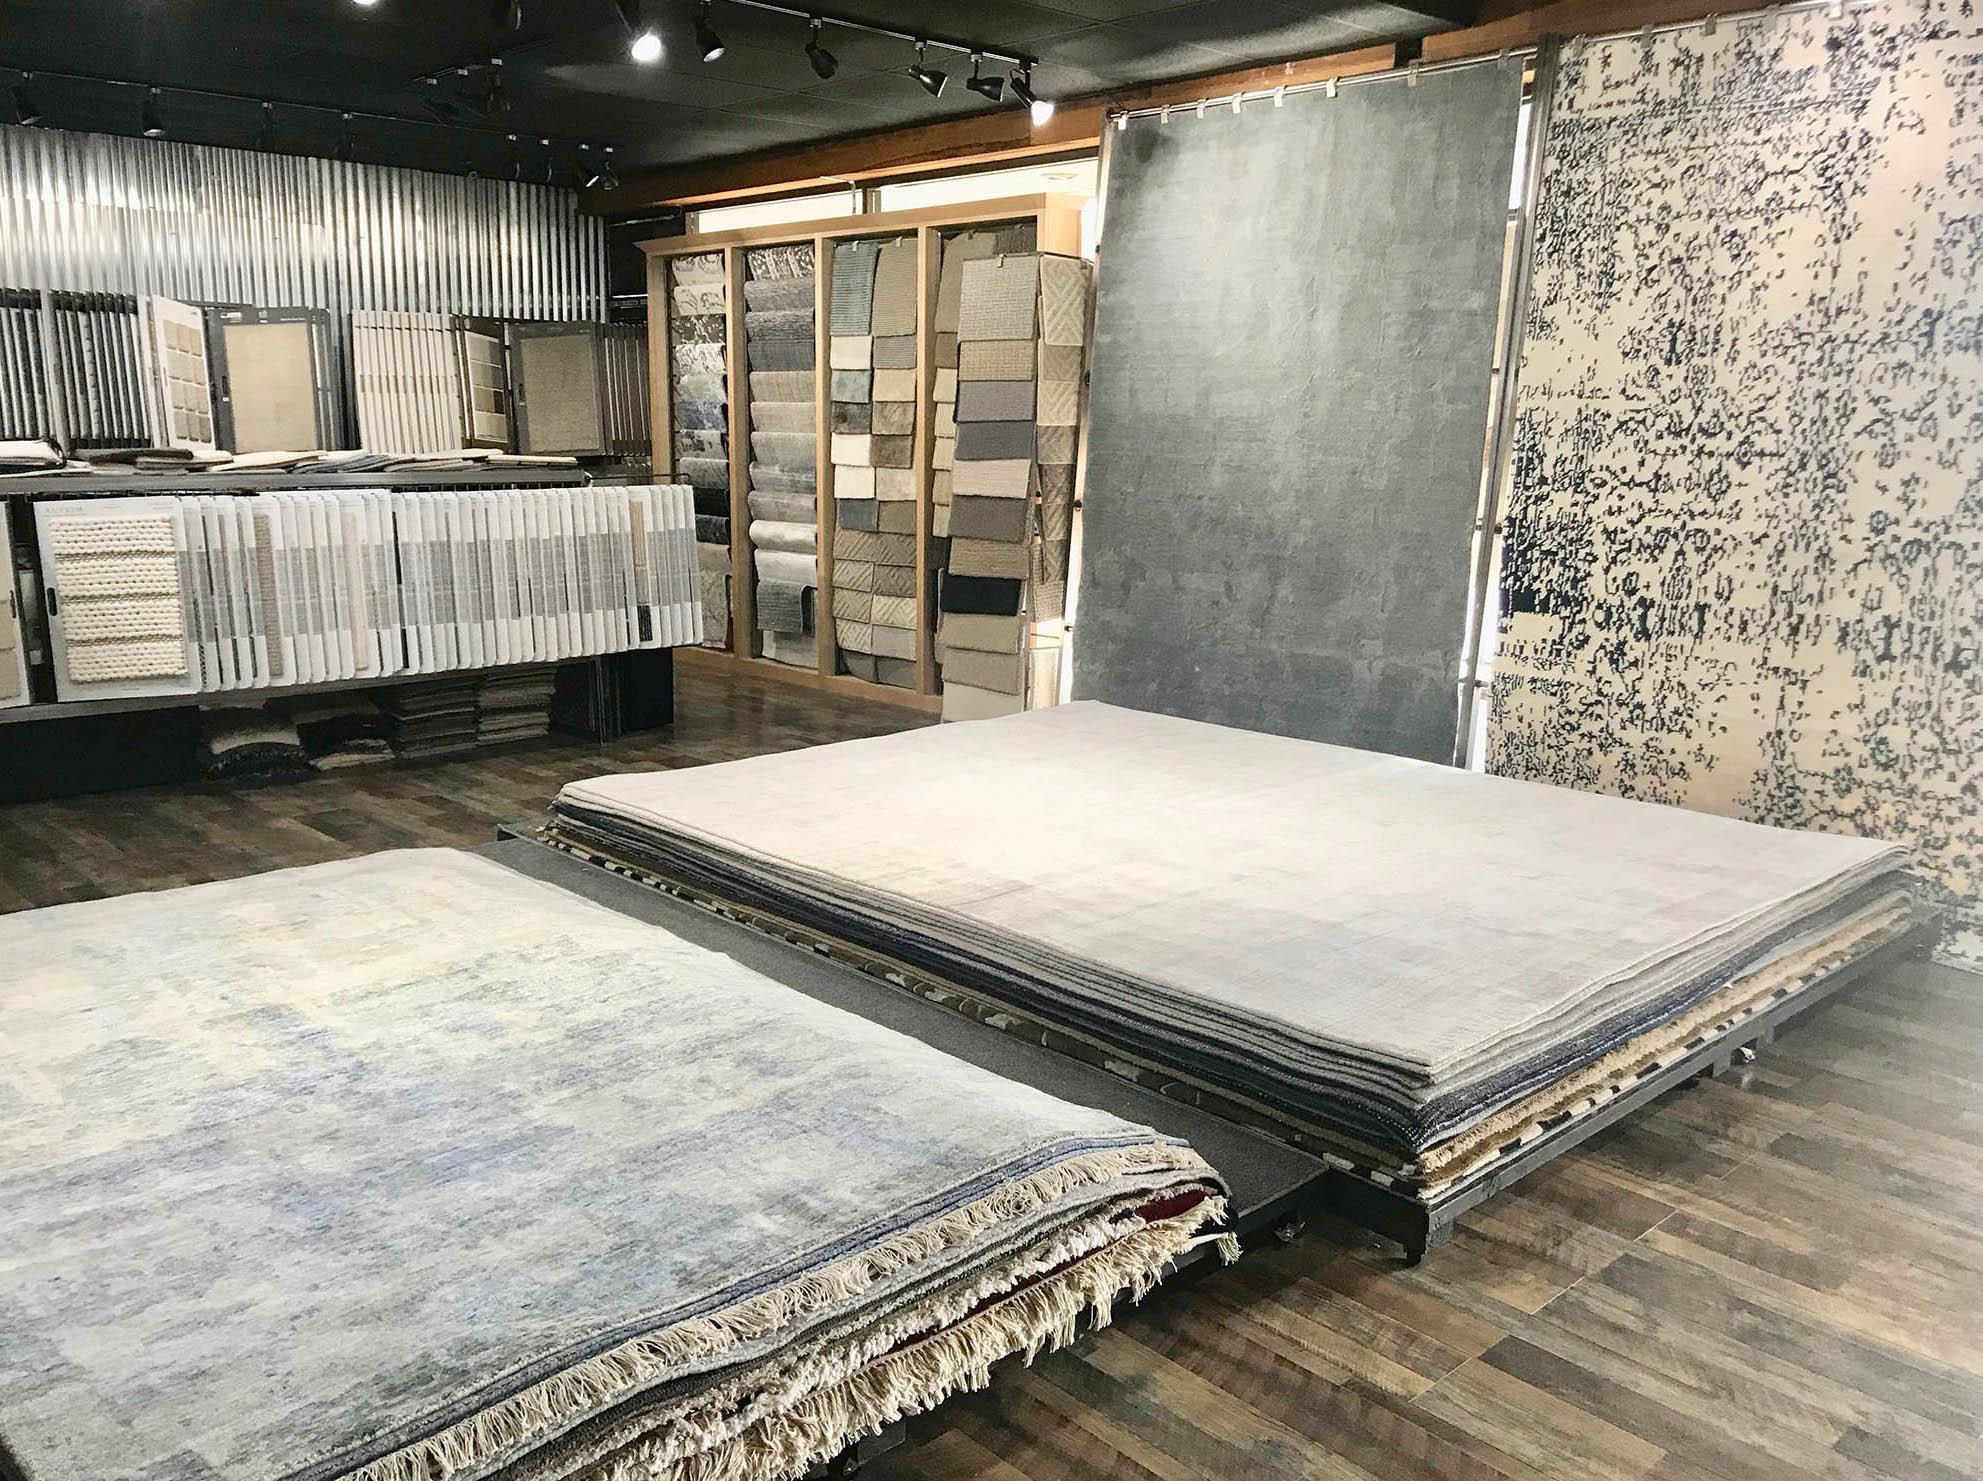 Refined Rug Restoration Rug Cleaning and Repair orange county, ca rug store online showroom oriental persian modern traditional area rugs